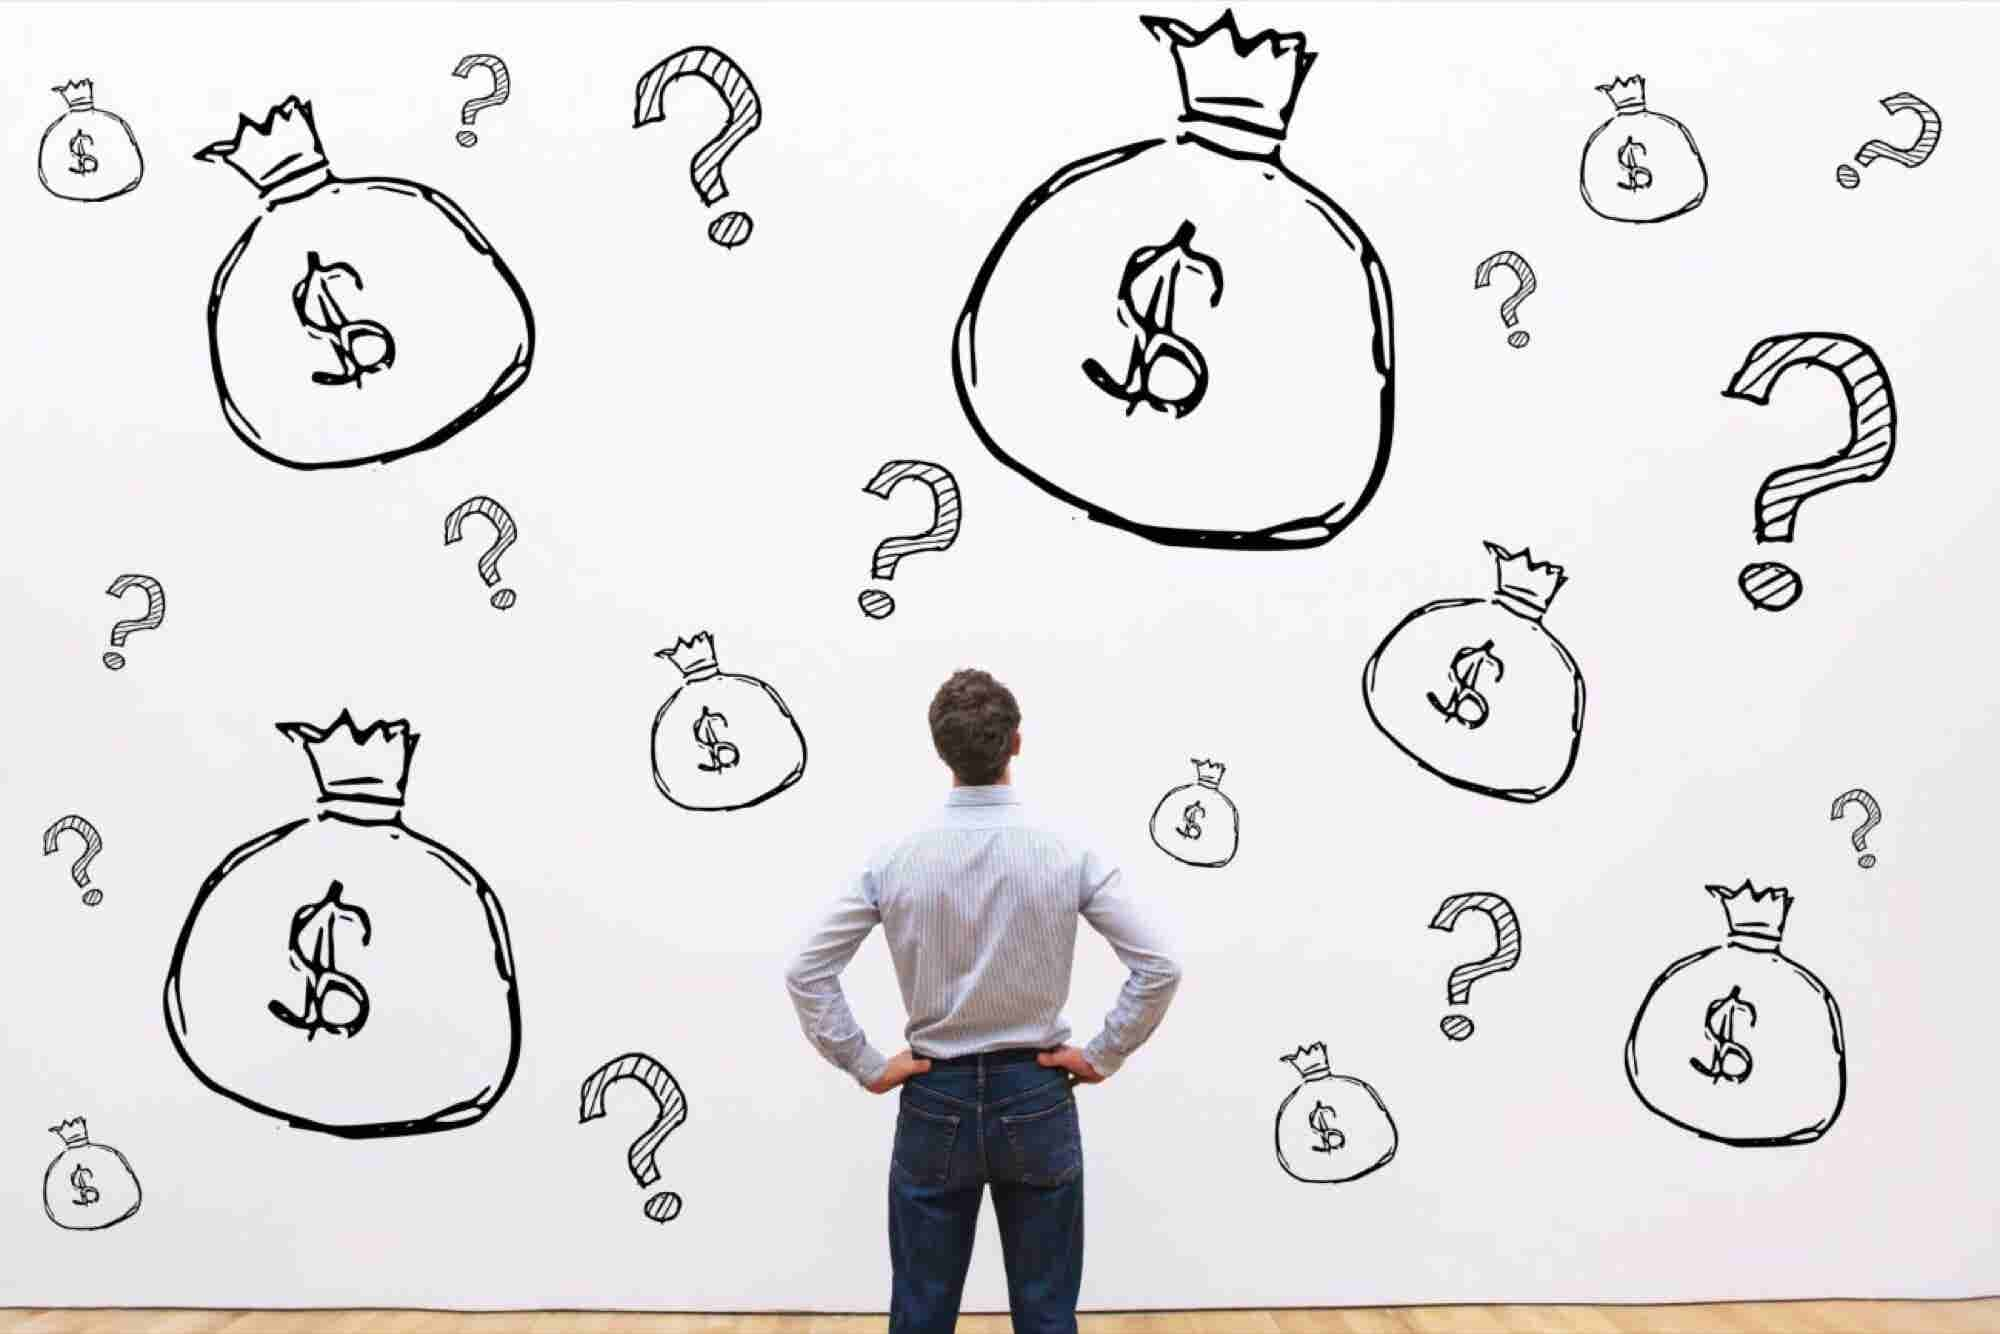 Strategies to Quash Financial Crisis for Mid-Life Entrepreneurs